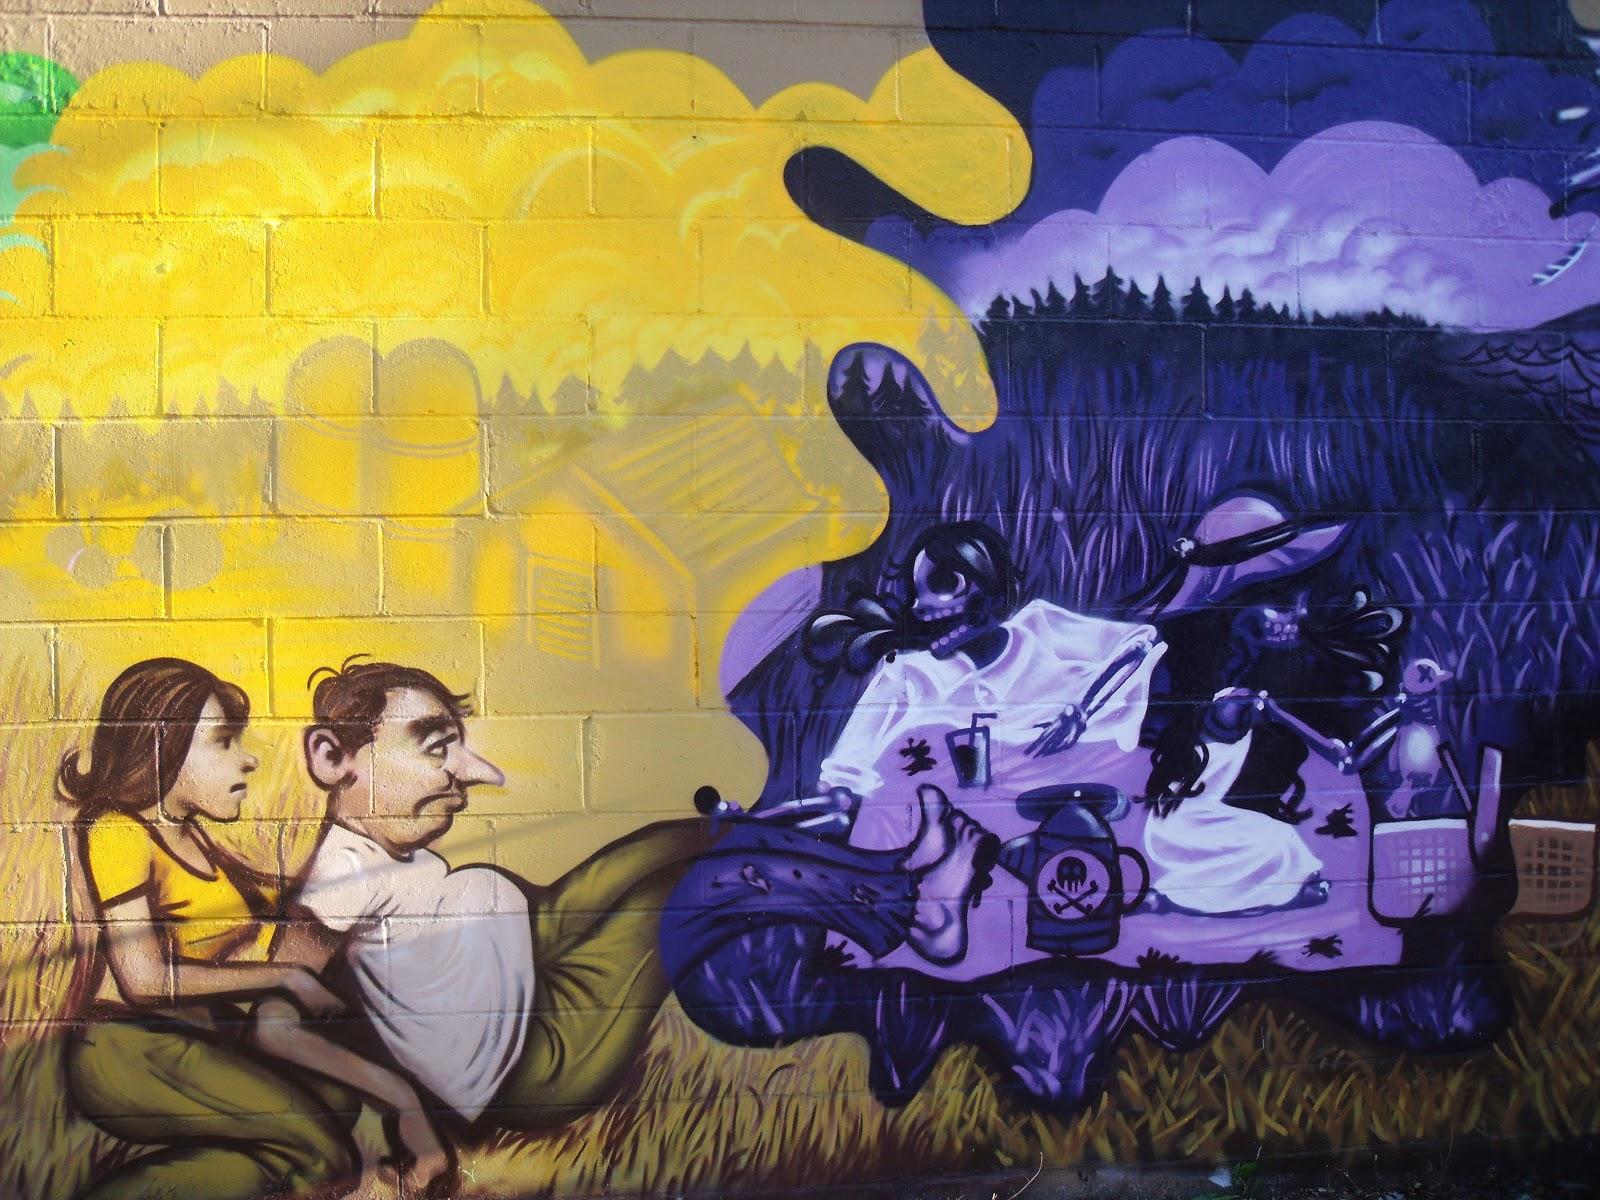 Jordan Malcolm Hamilton: Community Murals